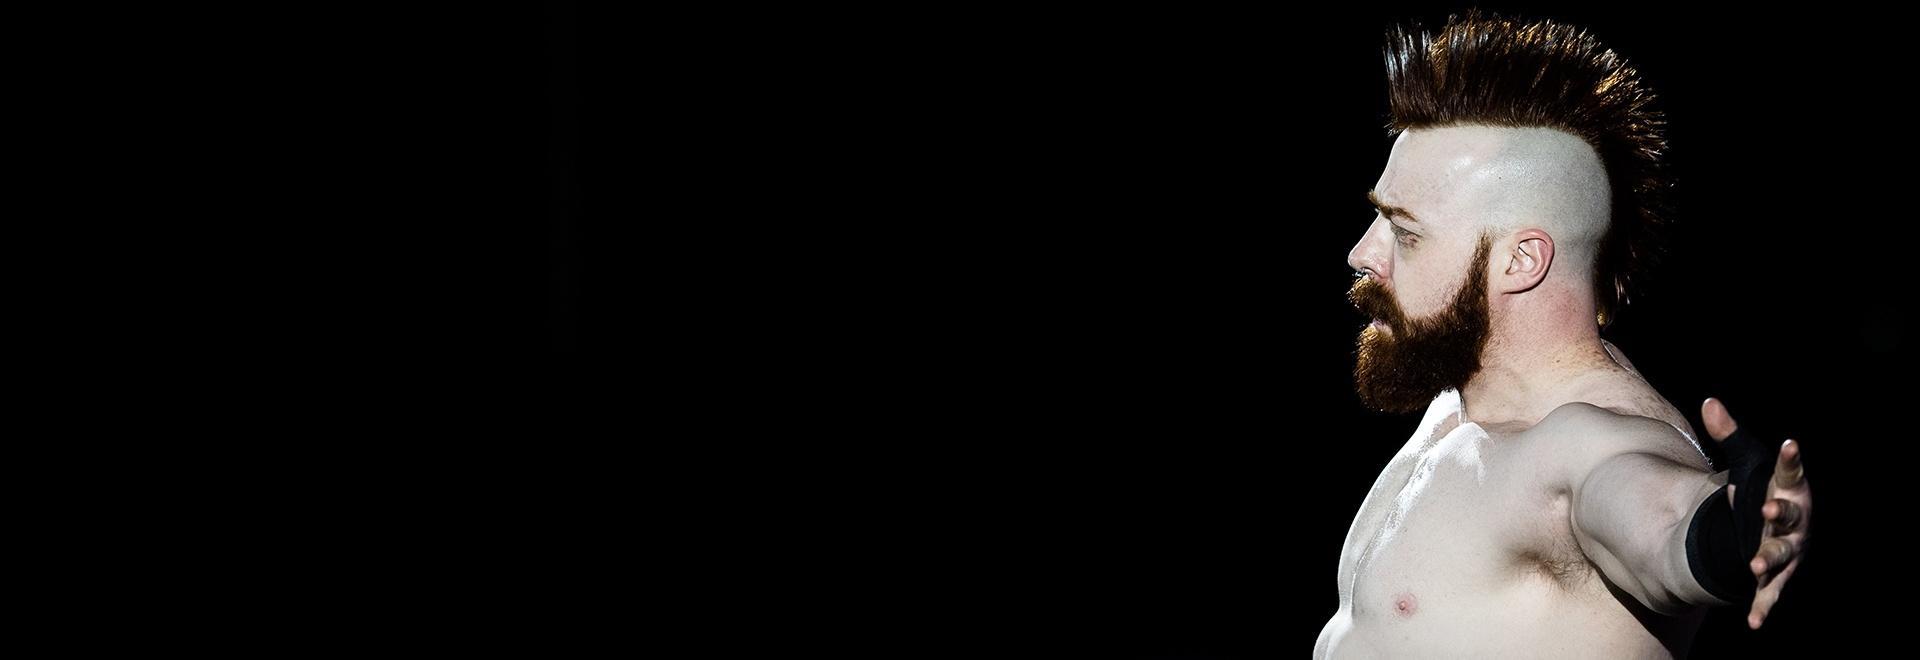 Ep. 46